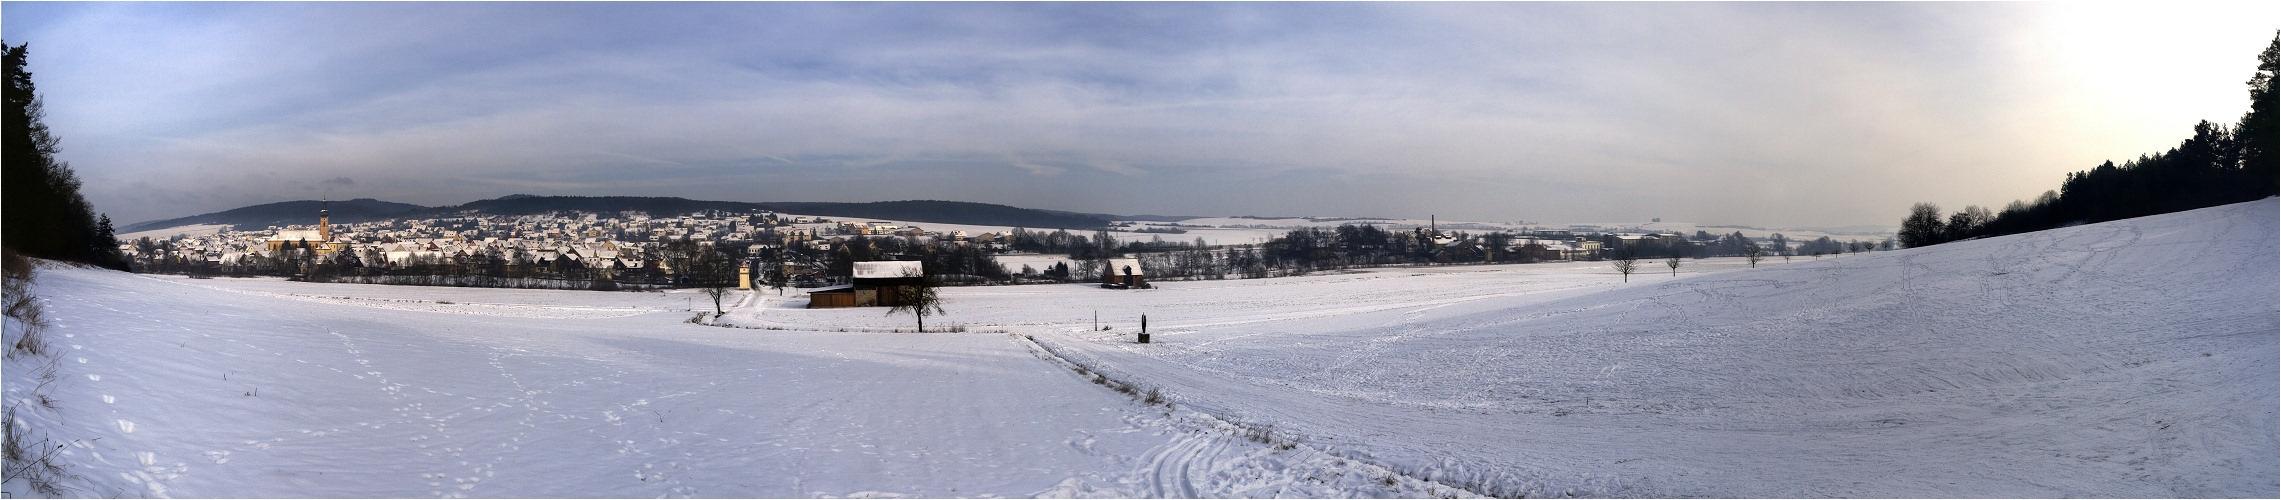 Stockheim/Rhön